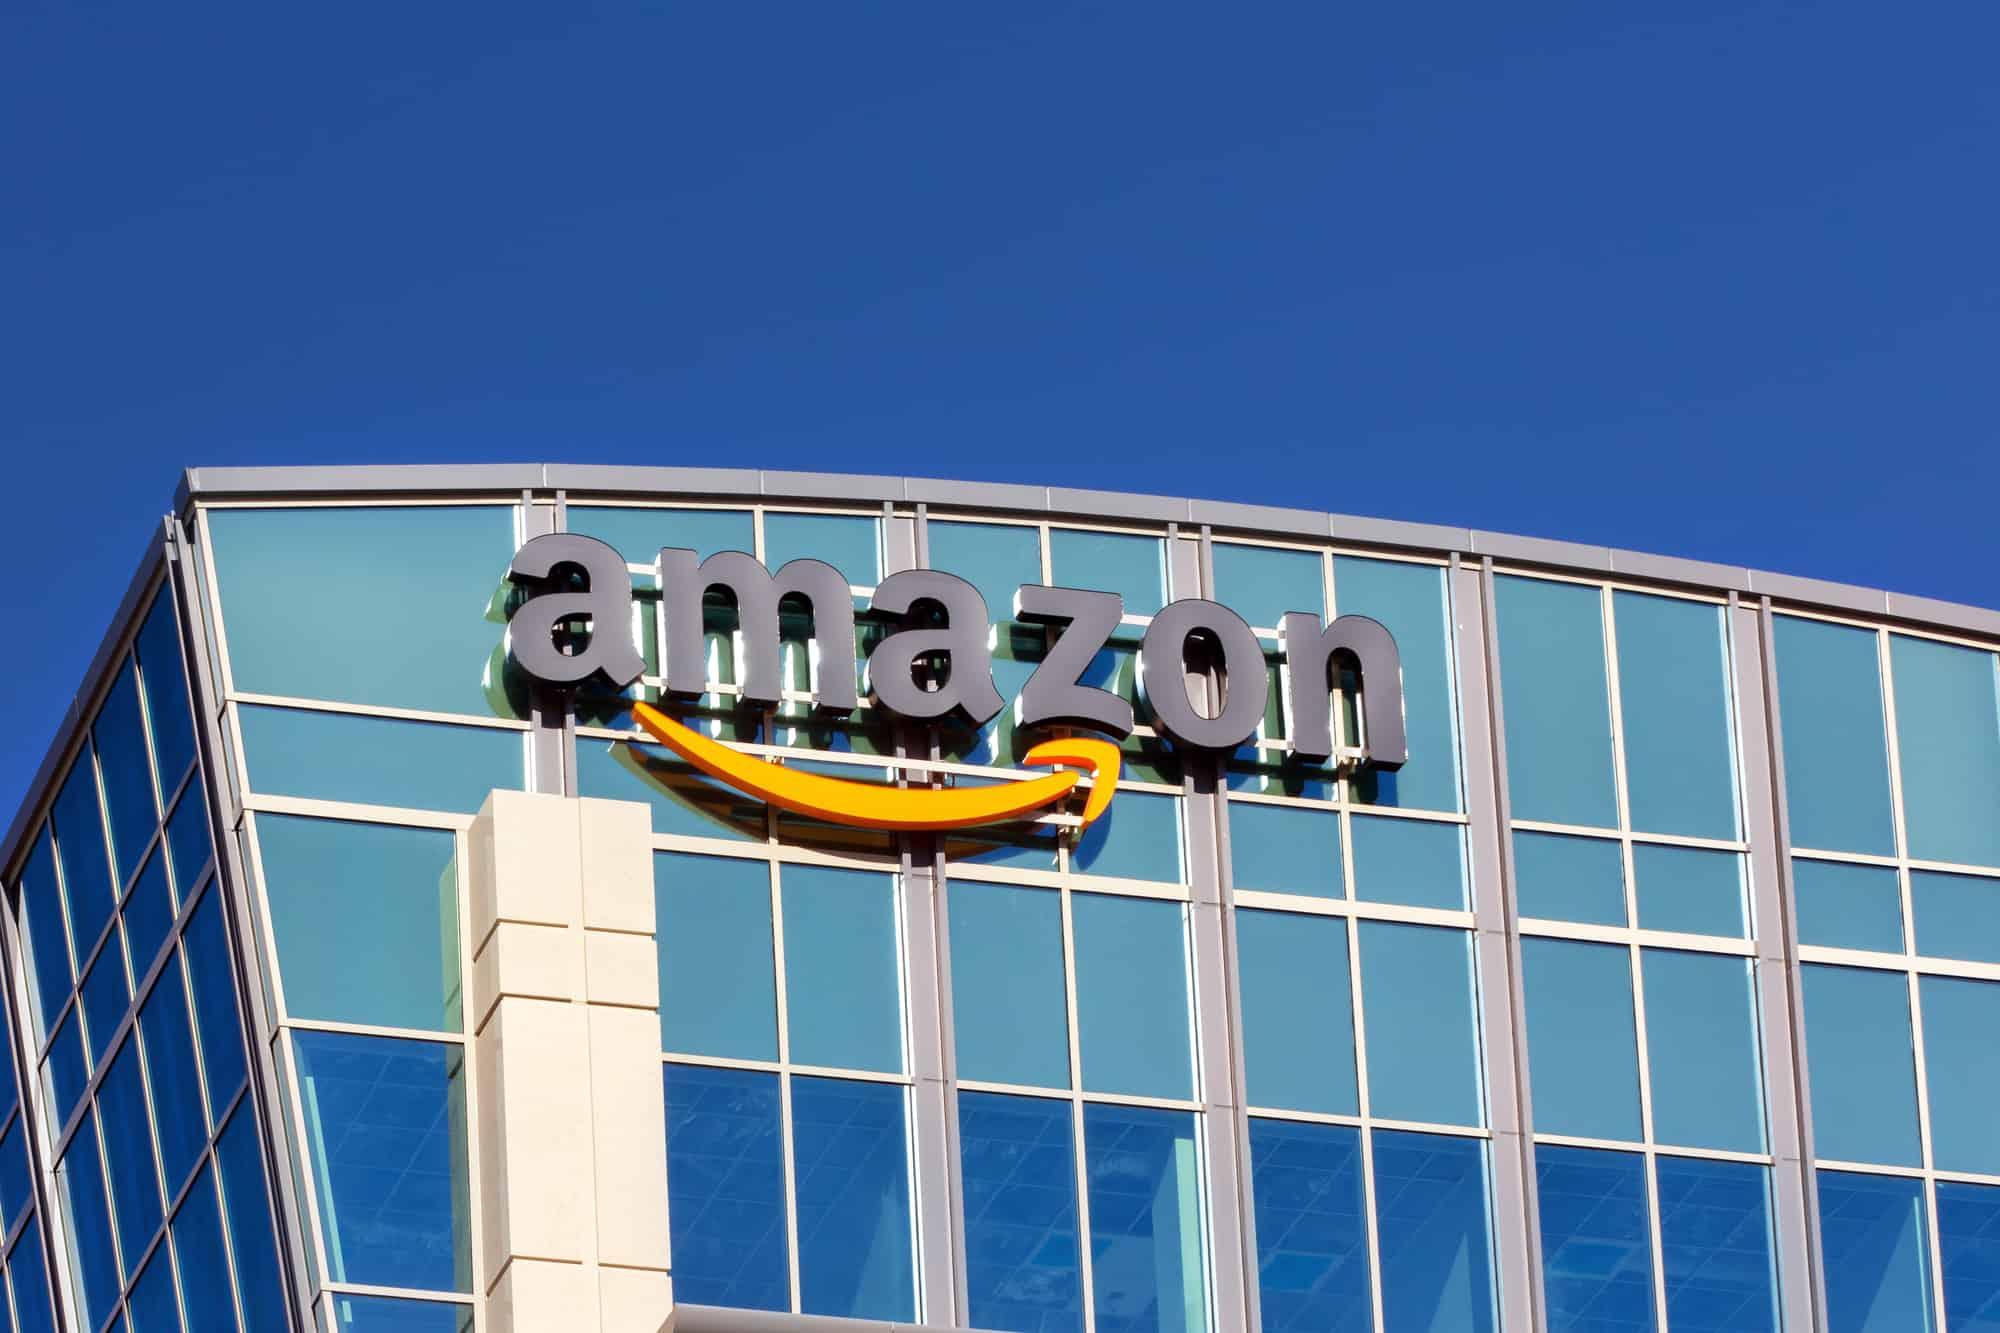 Move of the Week: Matt Birch working with Amazon